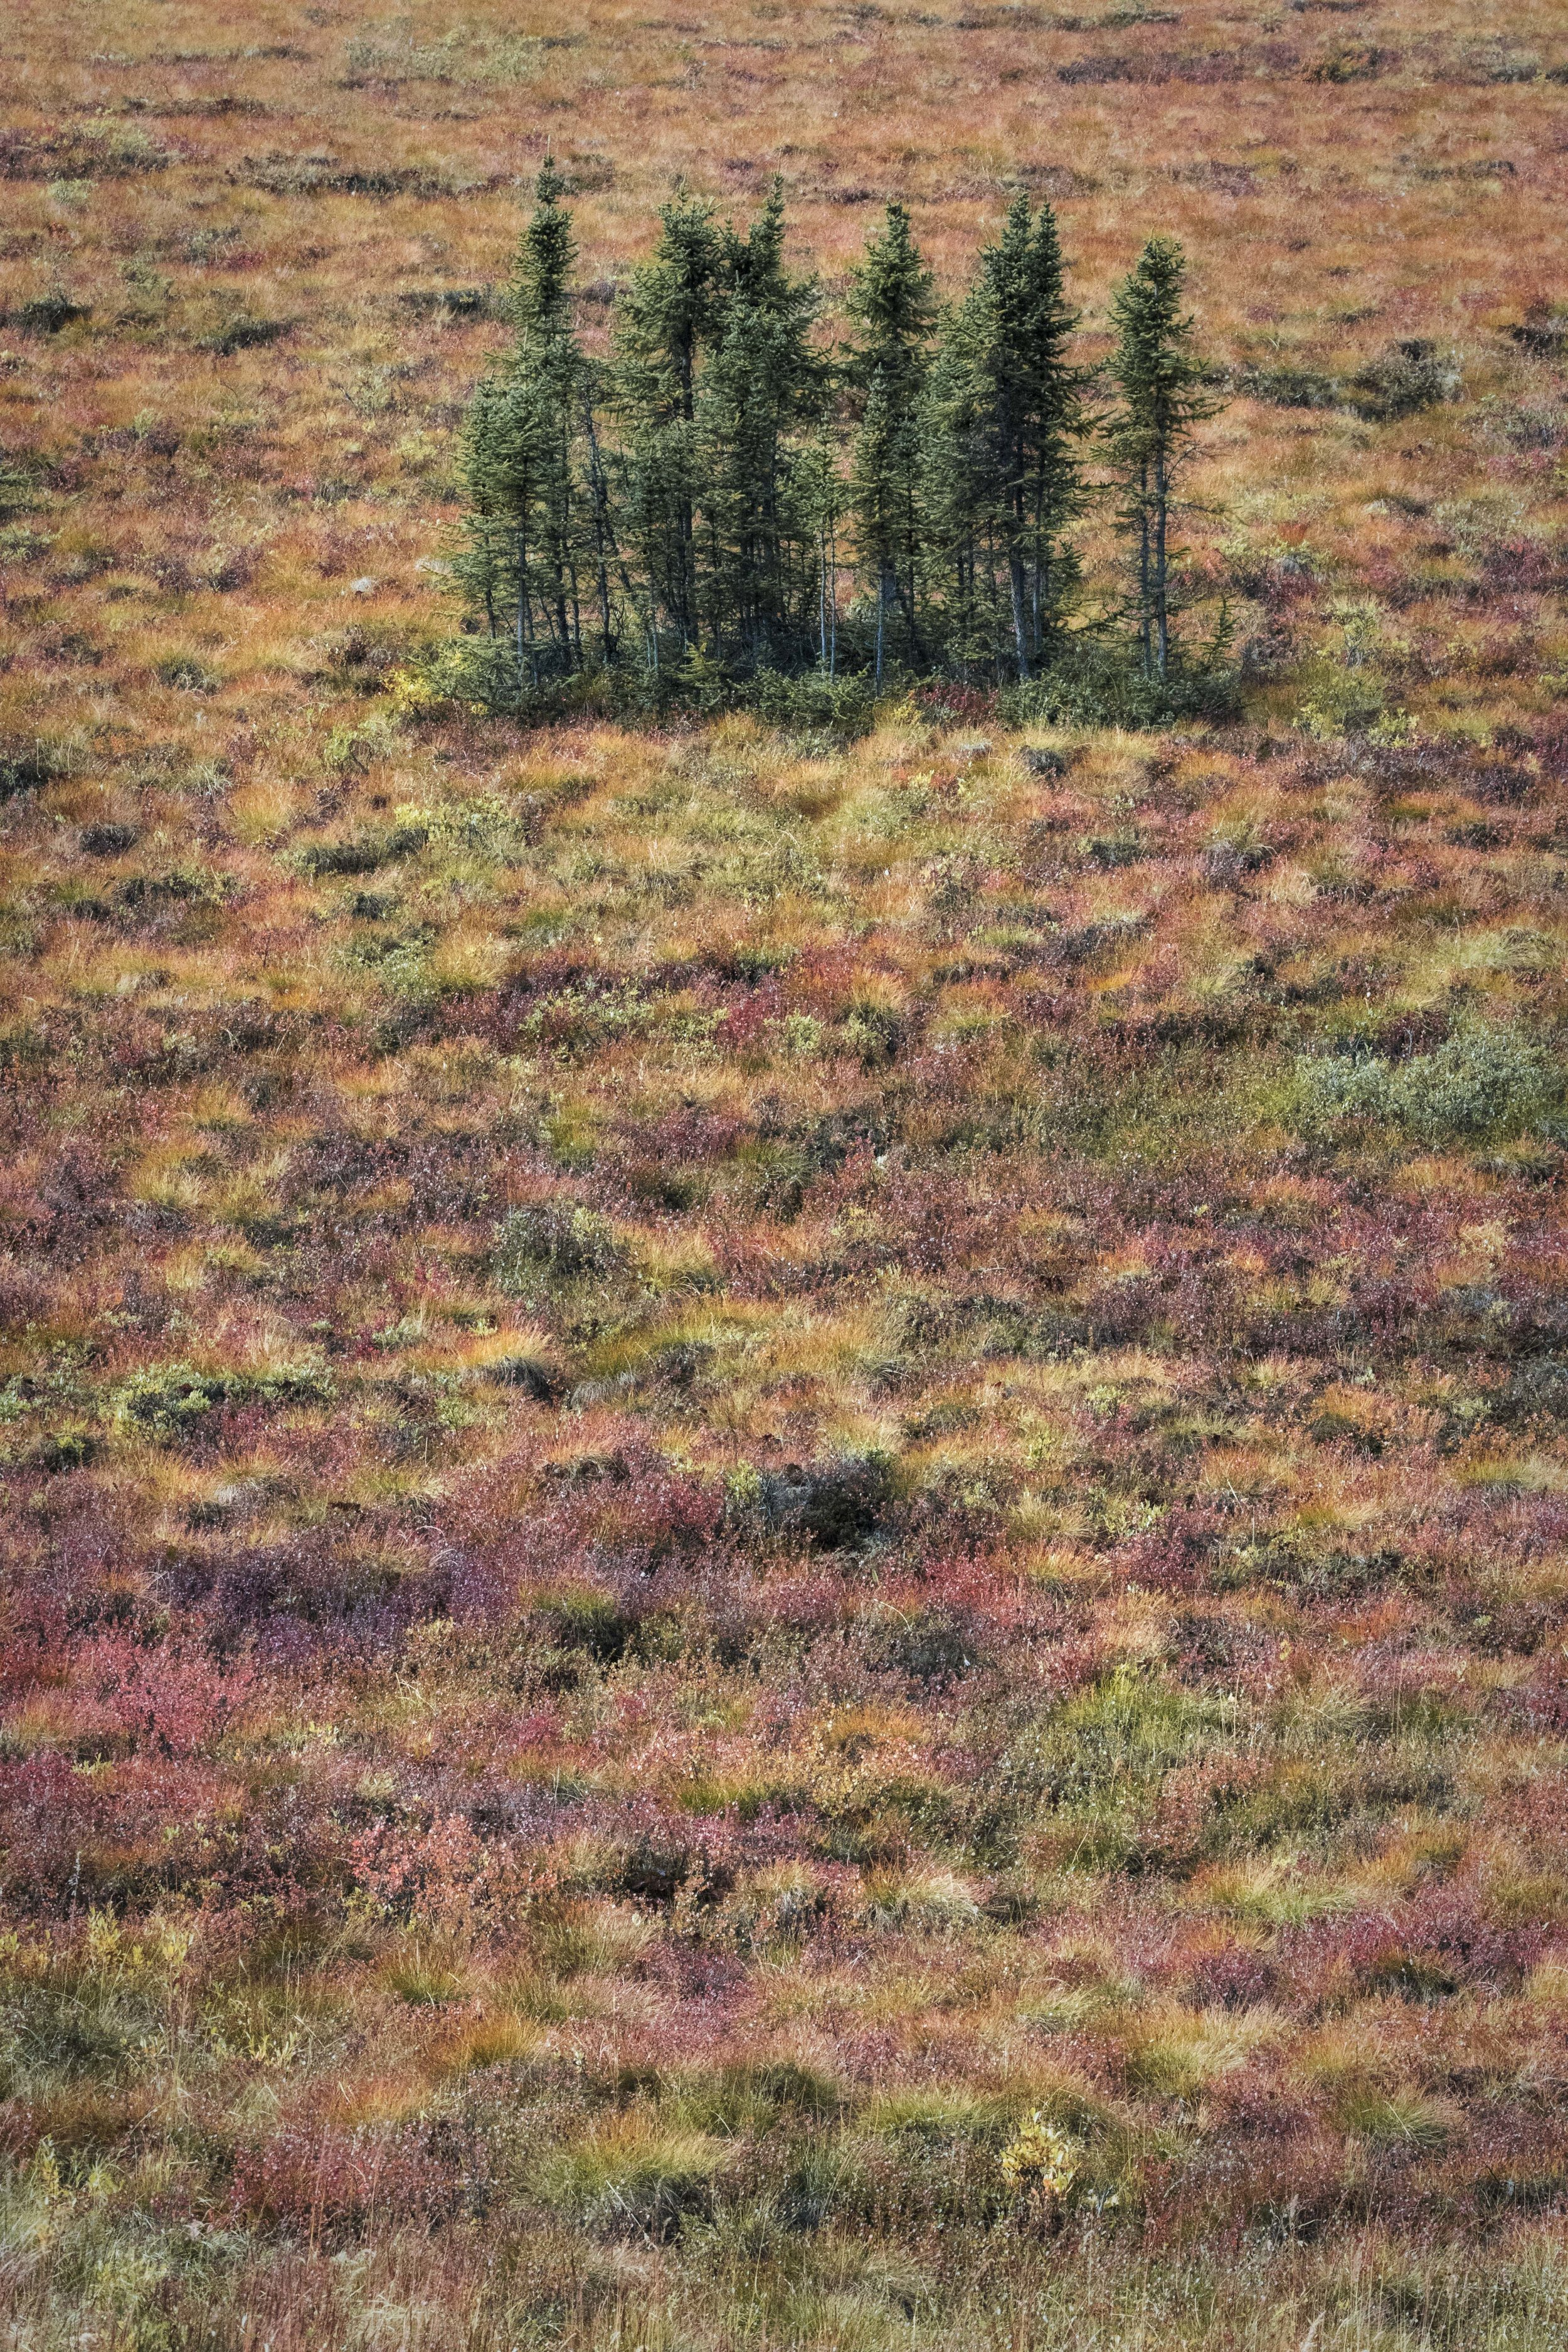 Dempster Highway, Roadtrip, Landscape, Arctic, rob gubiani, Tundra, Tombstone, Tuktoyuktuk, Inuvik, Dempster, Yukon, travel, wanderlust, boreal, forest, boreal forest, fall, autumn,